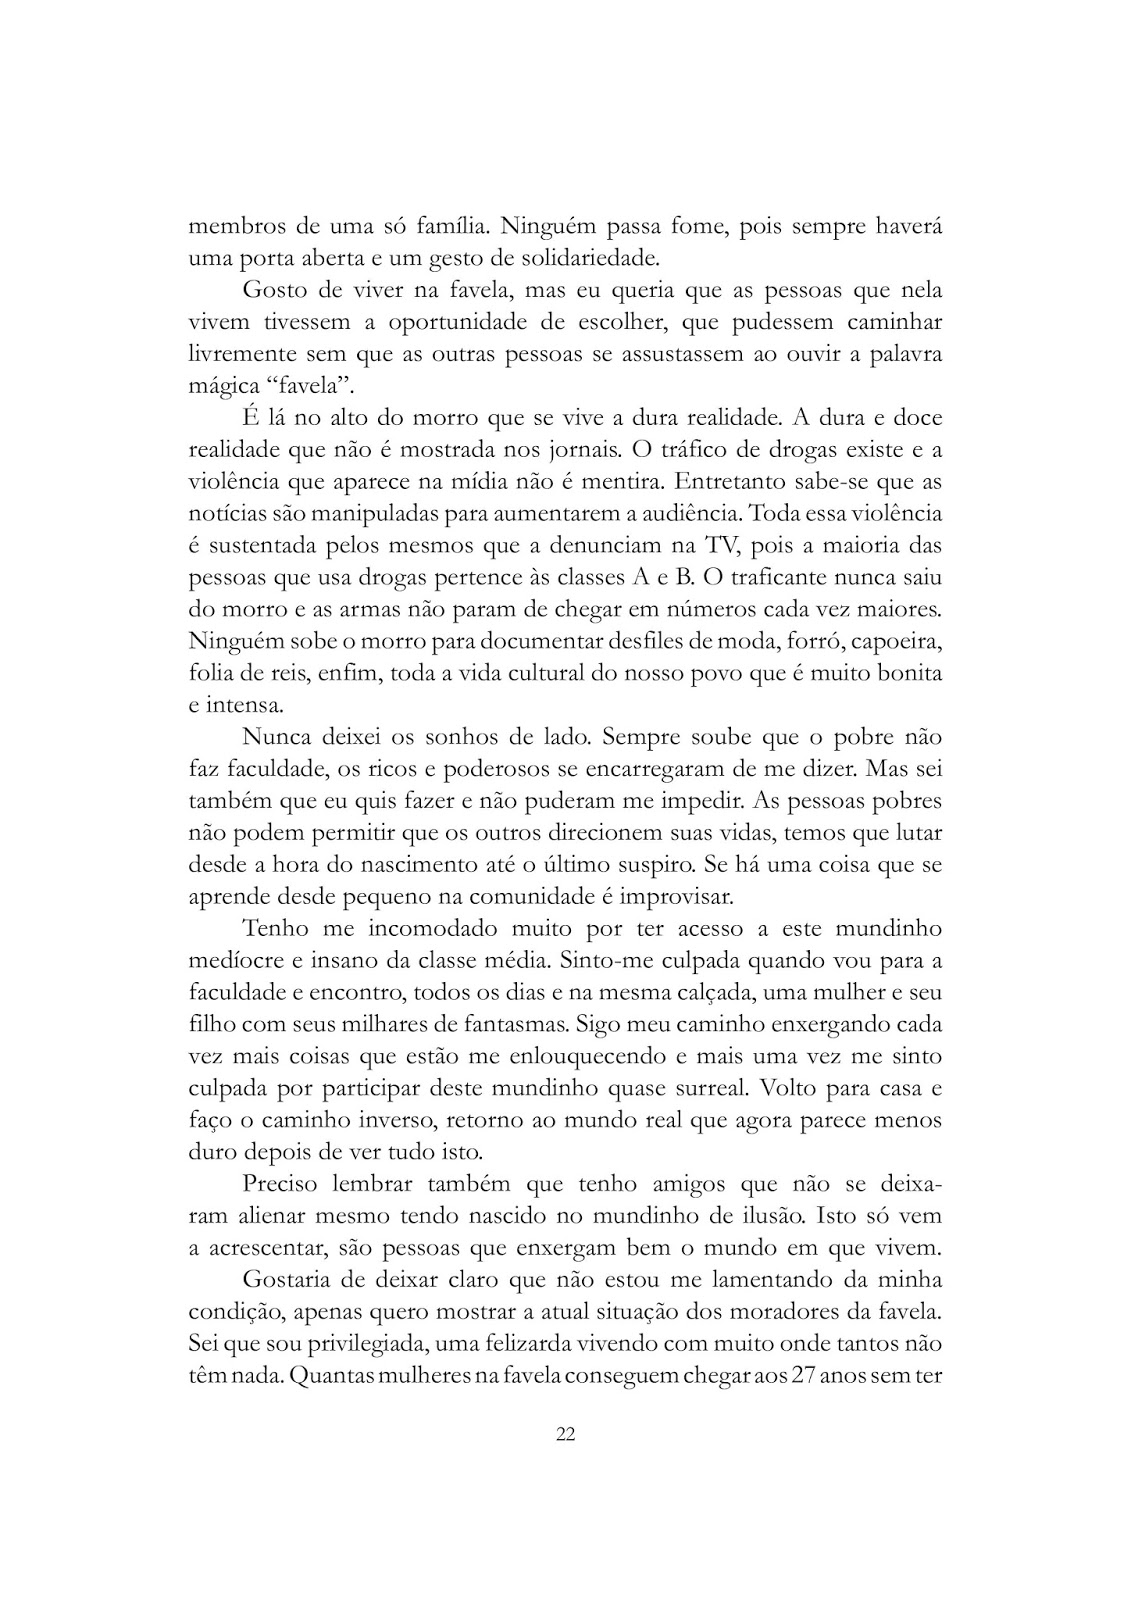 nos-22.jpg (1131×1600)